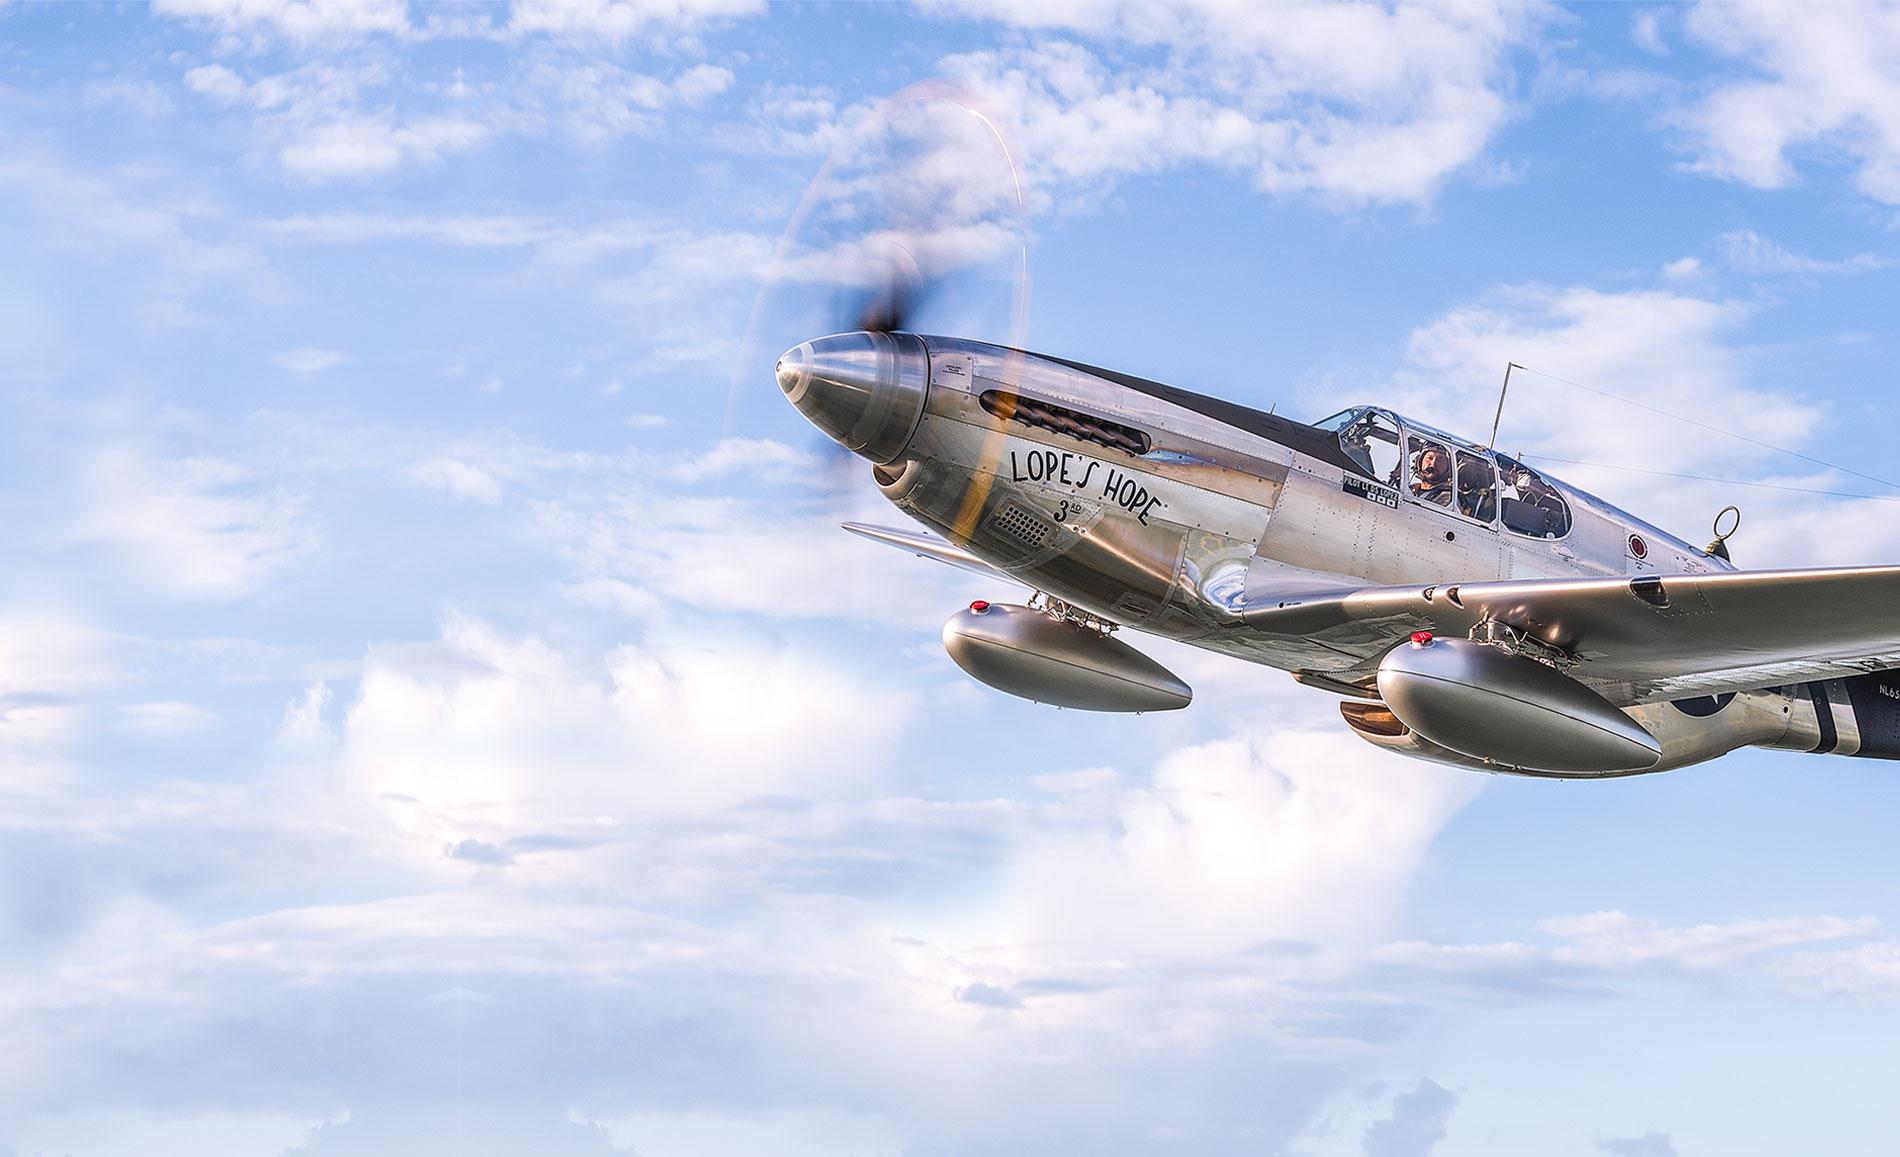 Restored P-51